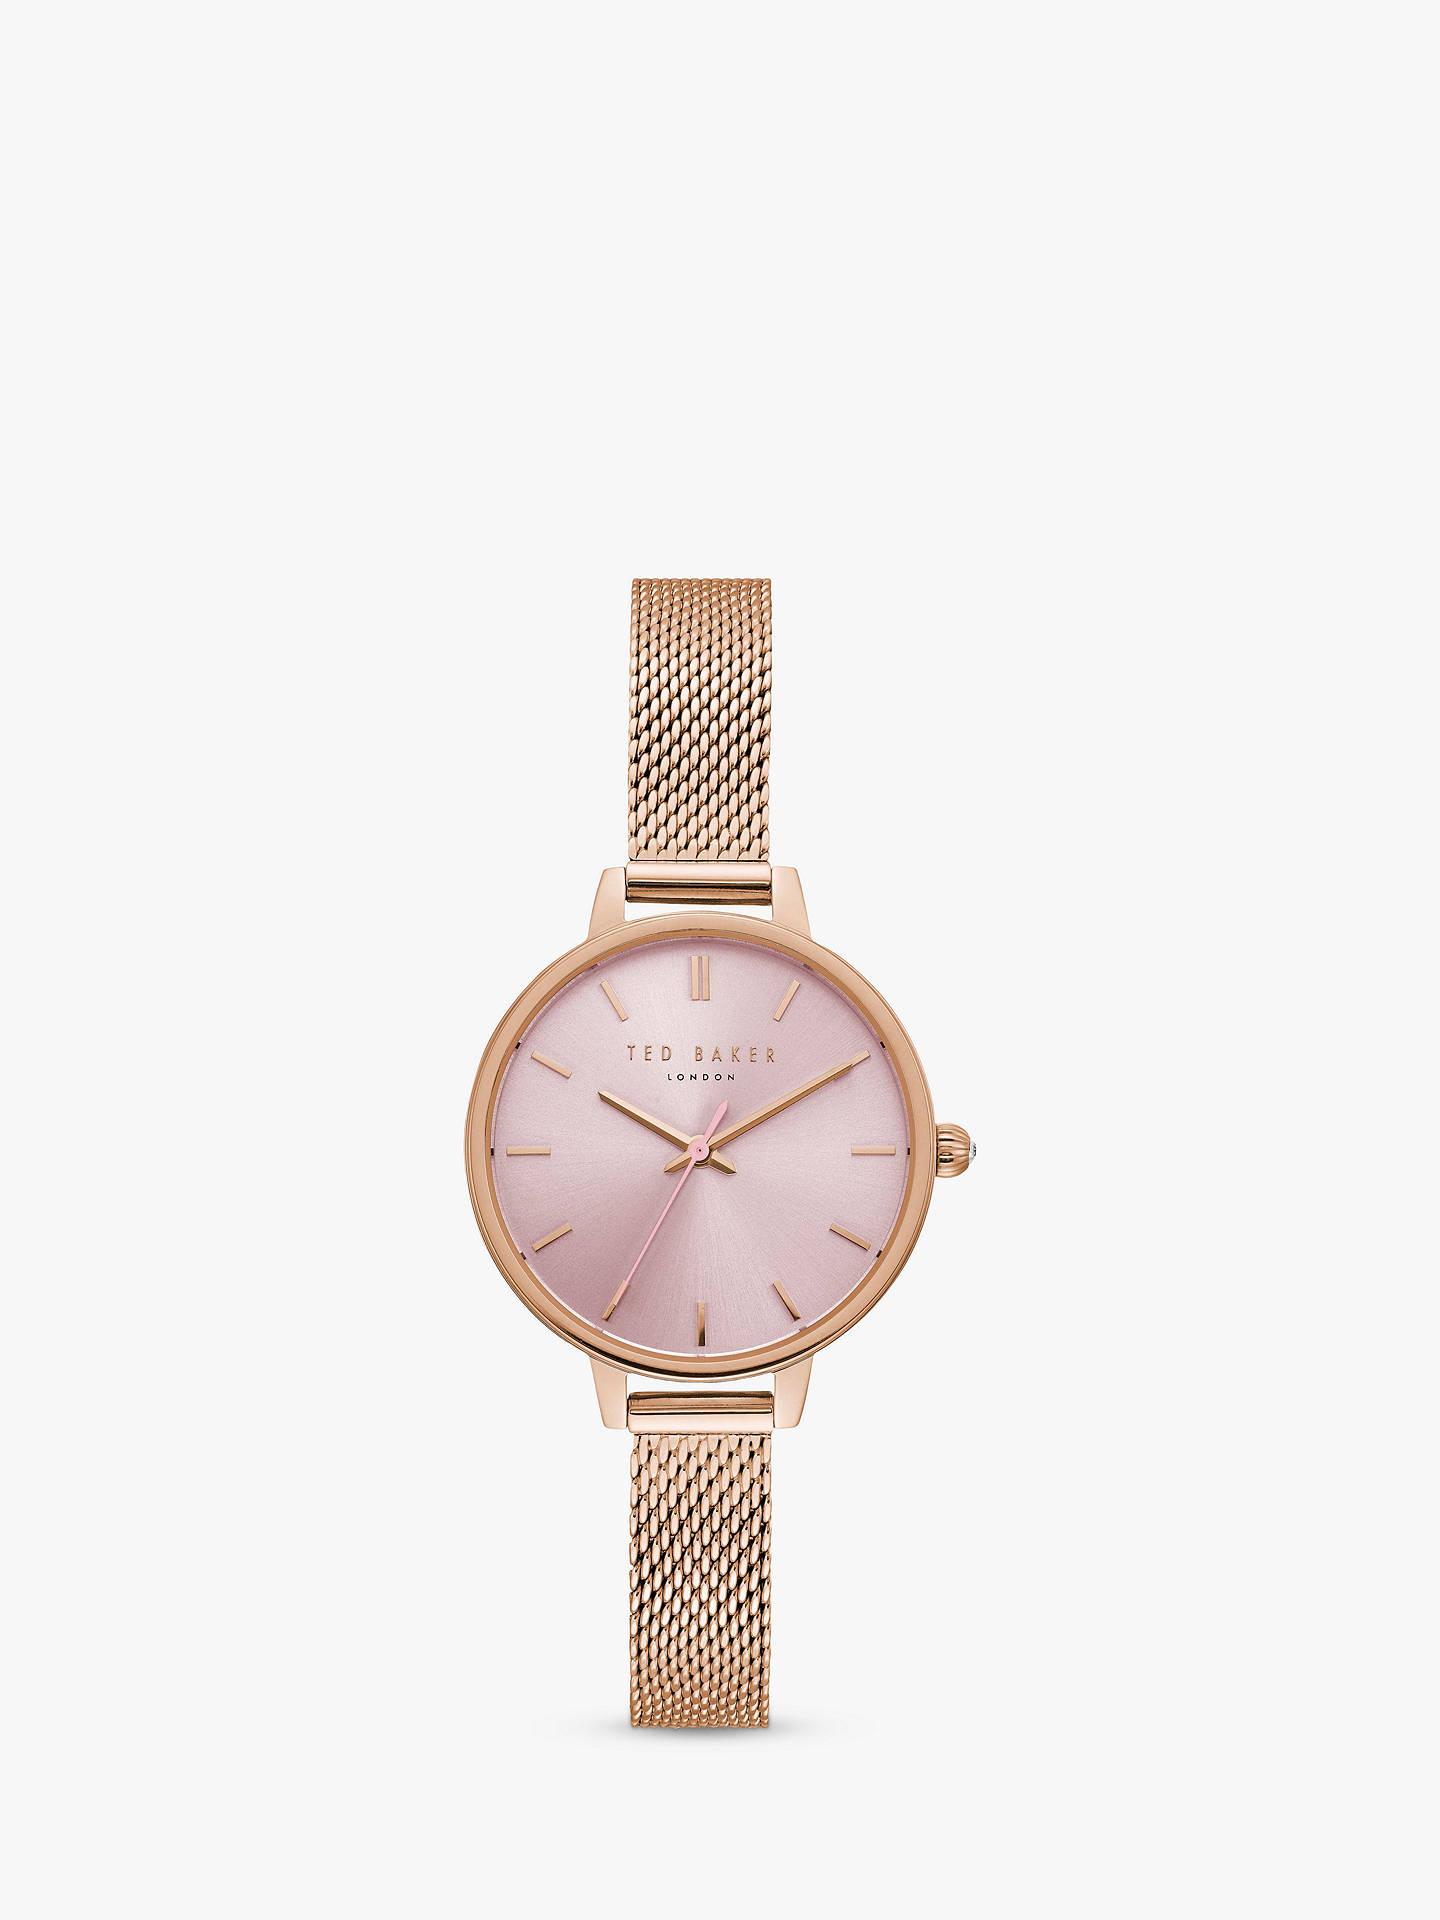 Ted Baker Women s Kate Mesh Bracelet Strap Watch at John Lewis ... 379ae7f5b